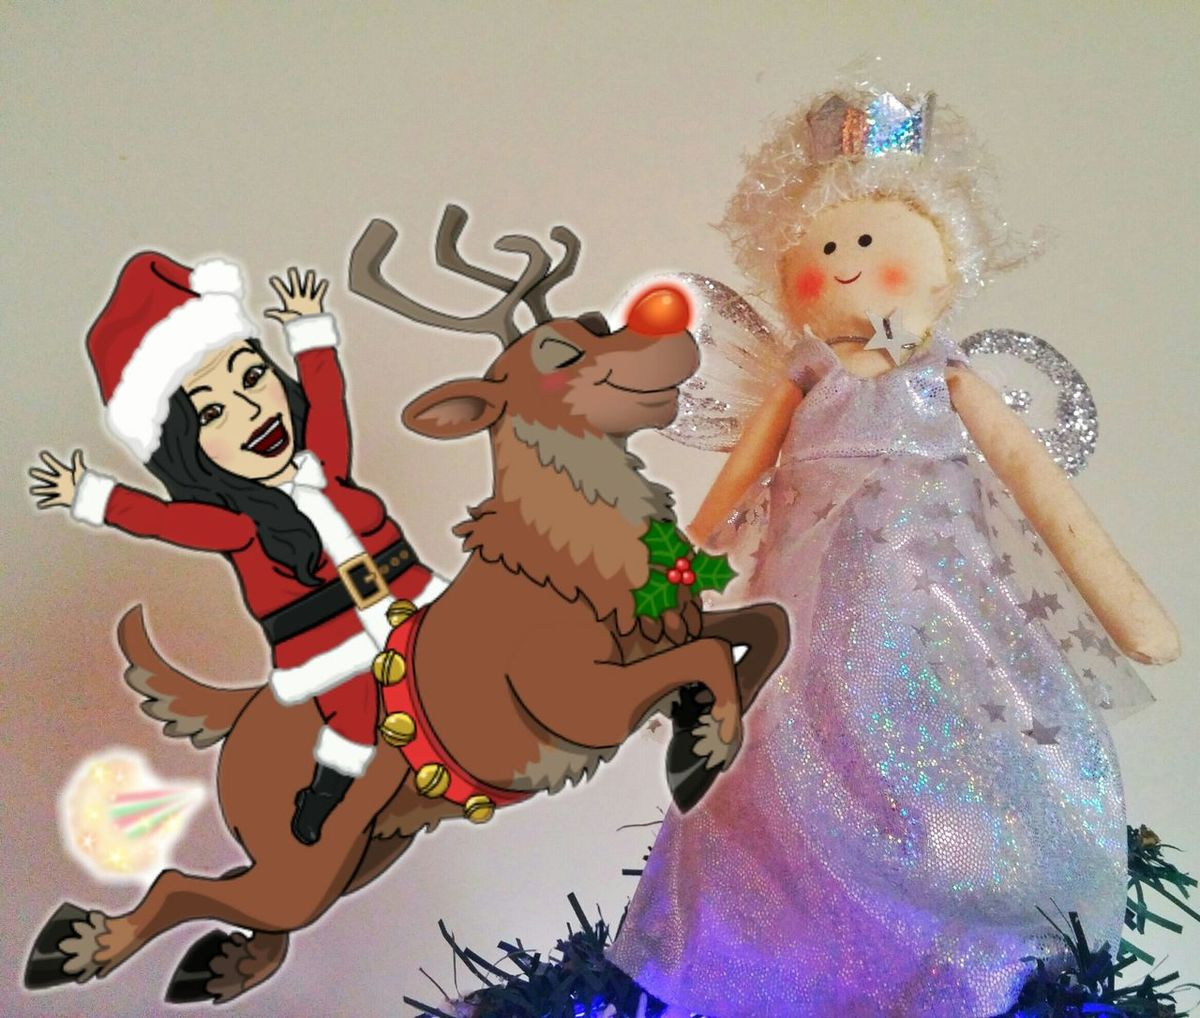 🎅🎁MERRY CHRISTMAS MY FRIENDS🎅🎁 Bitmoji Series On EE Merry 😄 Christmas🎁🎅 Santas Nice List🎅🎁😄👍 Ho Ho Ho🎅 Naughty Santa🎅 Lmfao😄👍 Those Tags Tho😂 Reindeer❤️❤️